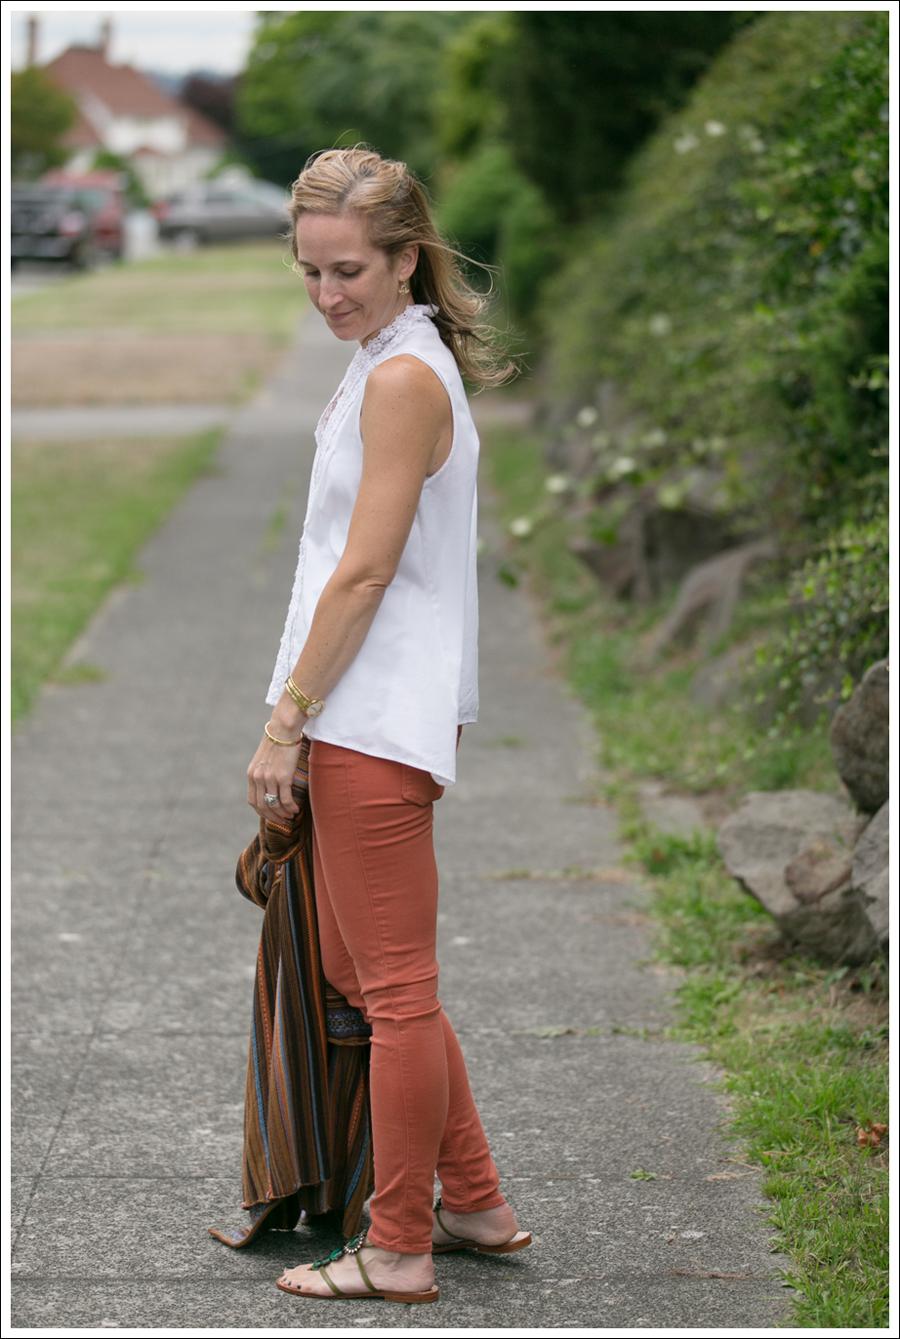 blogOrange Black Orchid Jeans White Top Pattern Swing Sweater-4